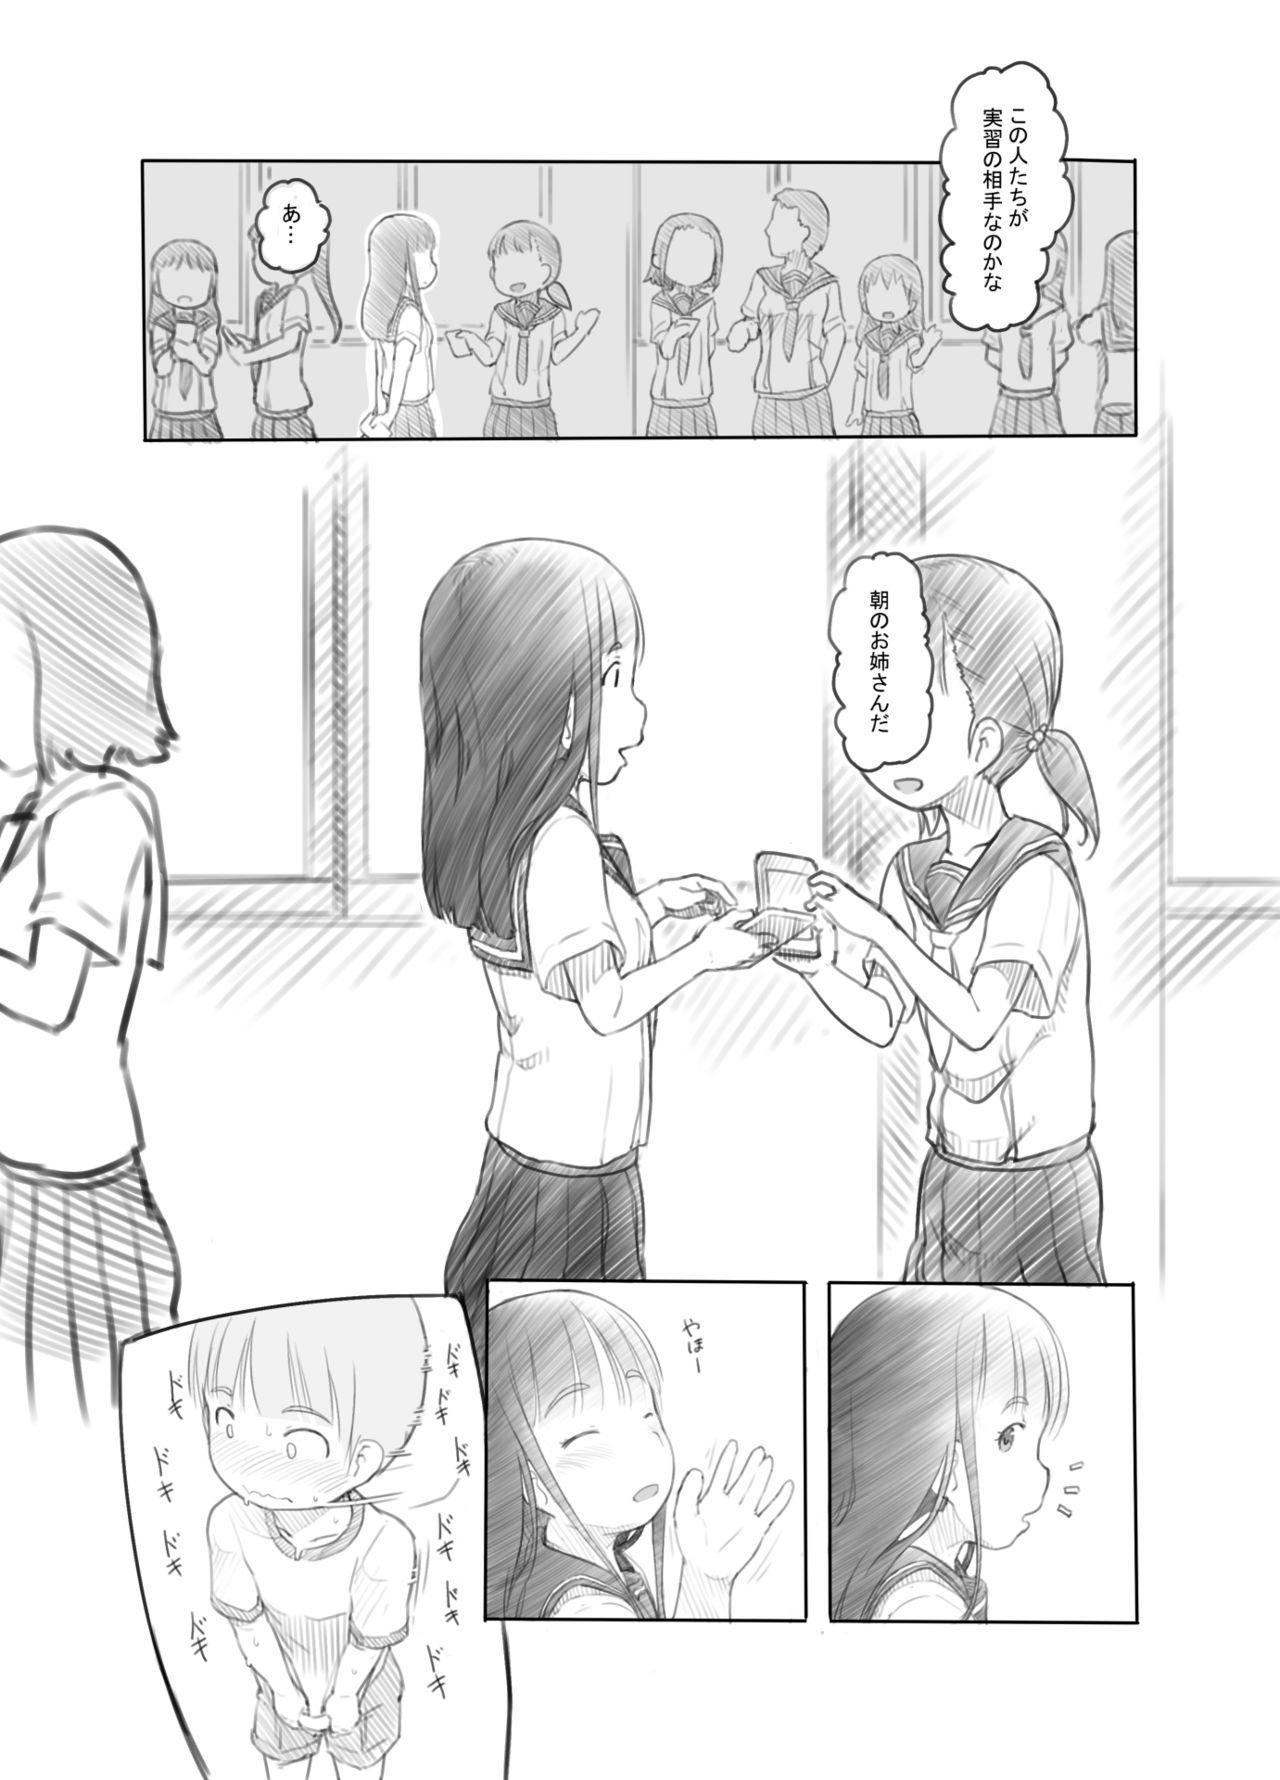 OneShota Sex Jisshuu 9